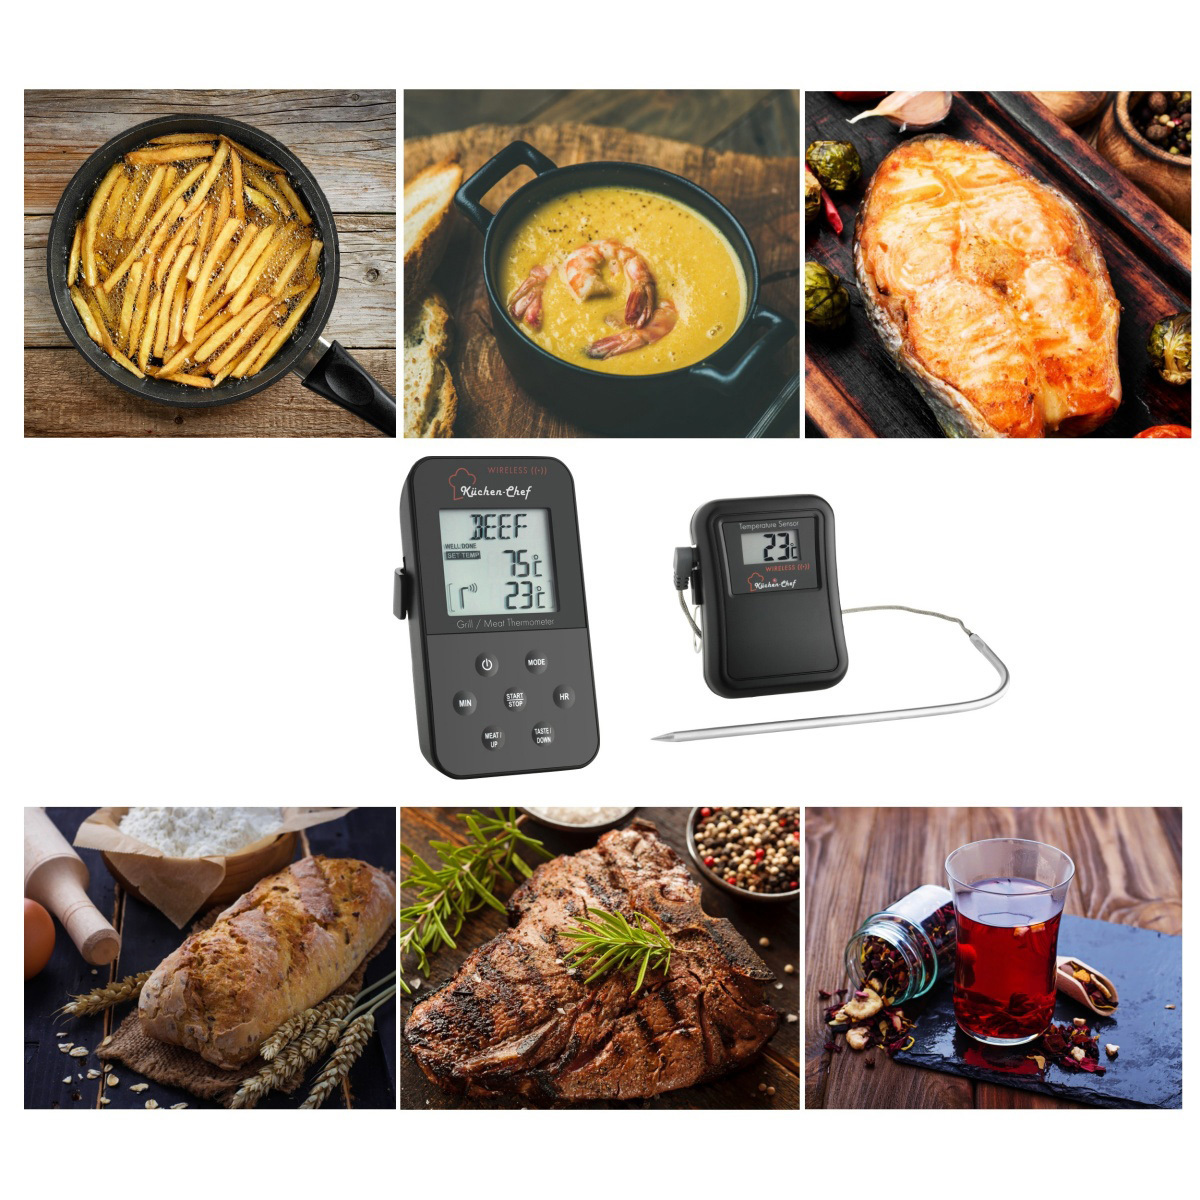 14-1504-funk-grill-bratenthermometer-küchen-chef-anwendung-1200x1200px.jpg